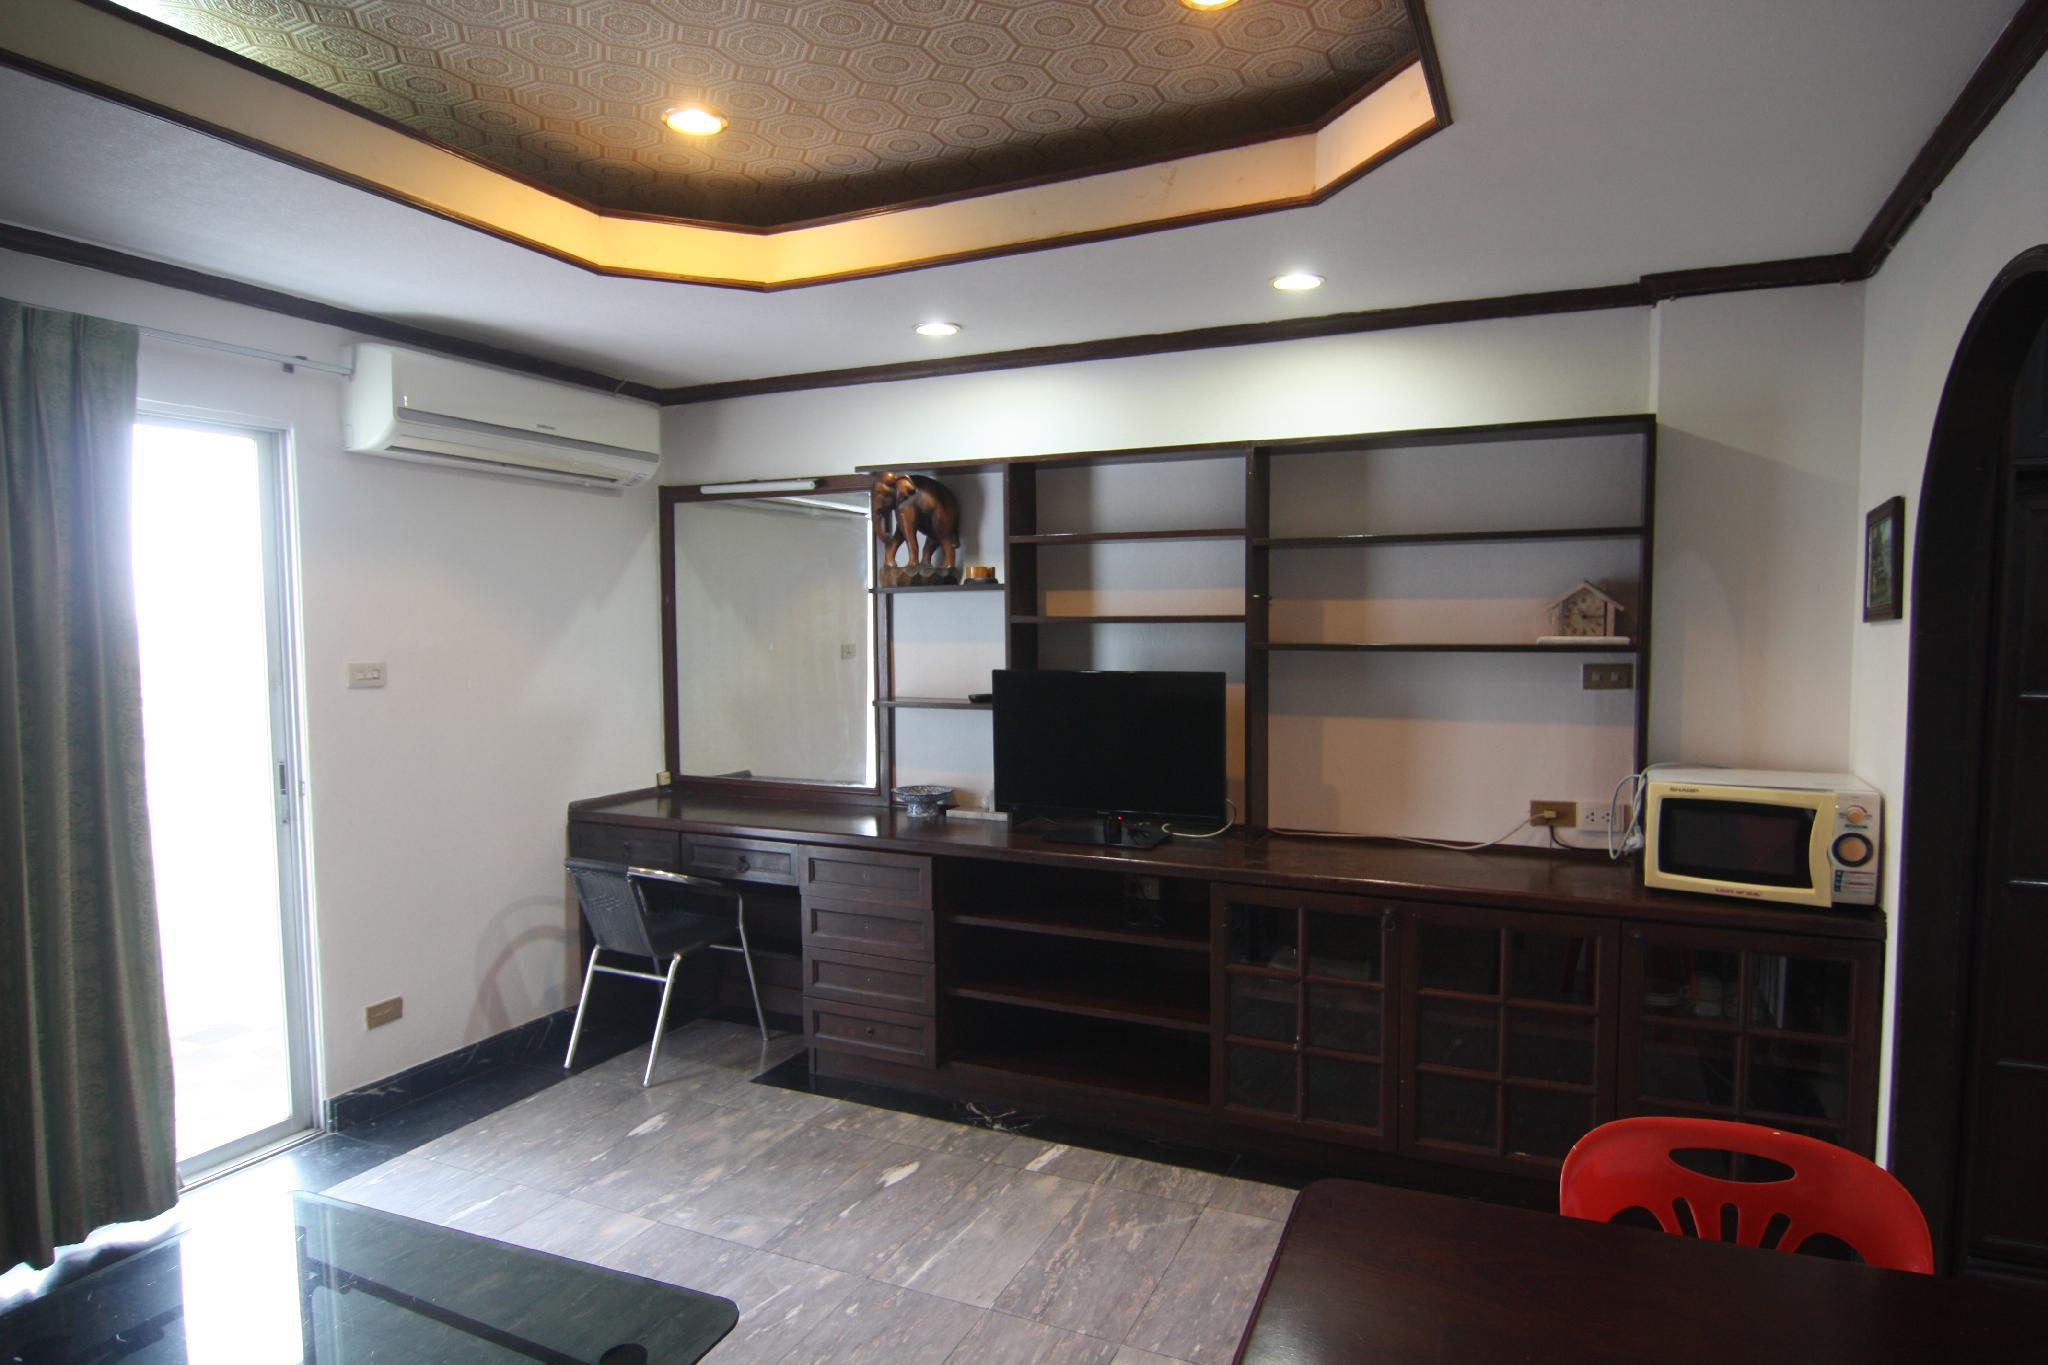 Pattaya Tower Room 10 4